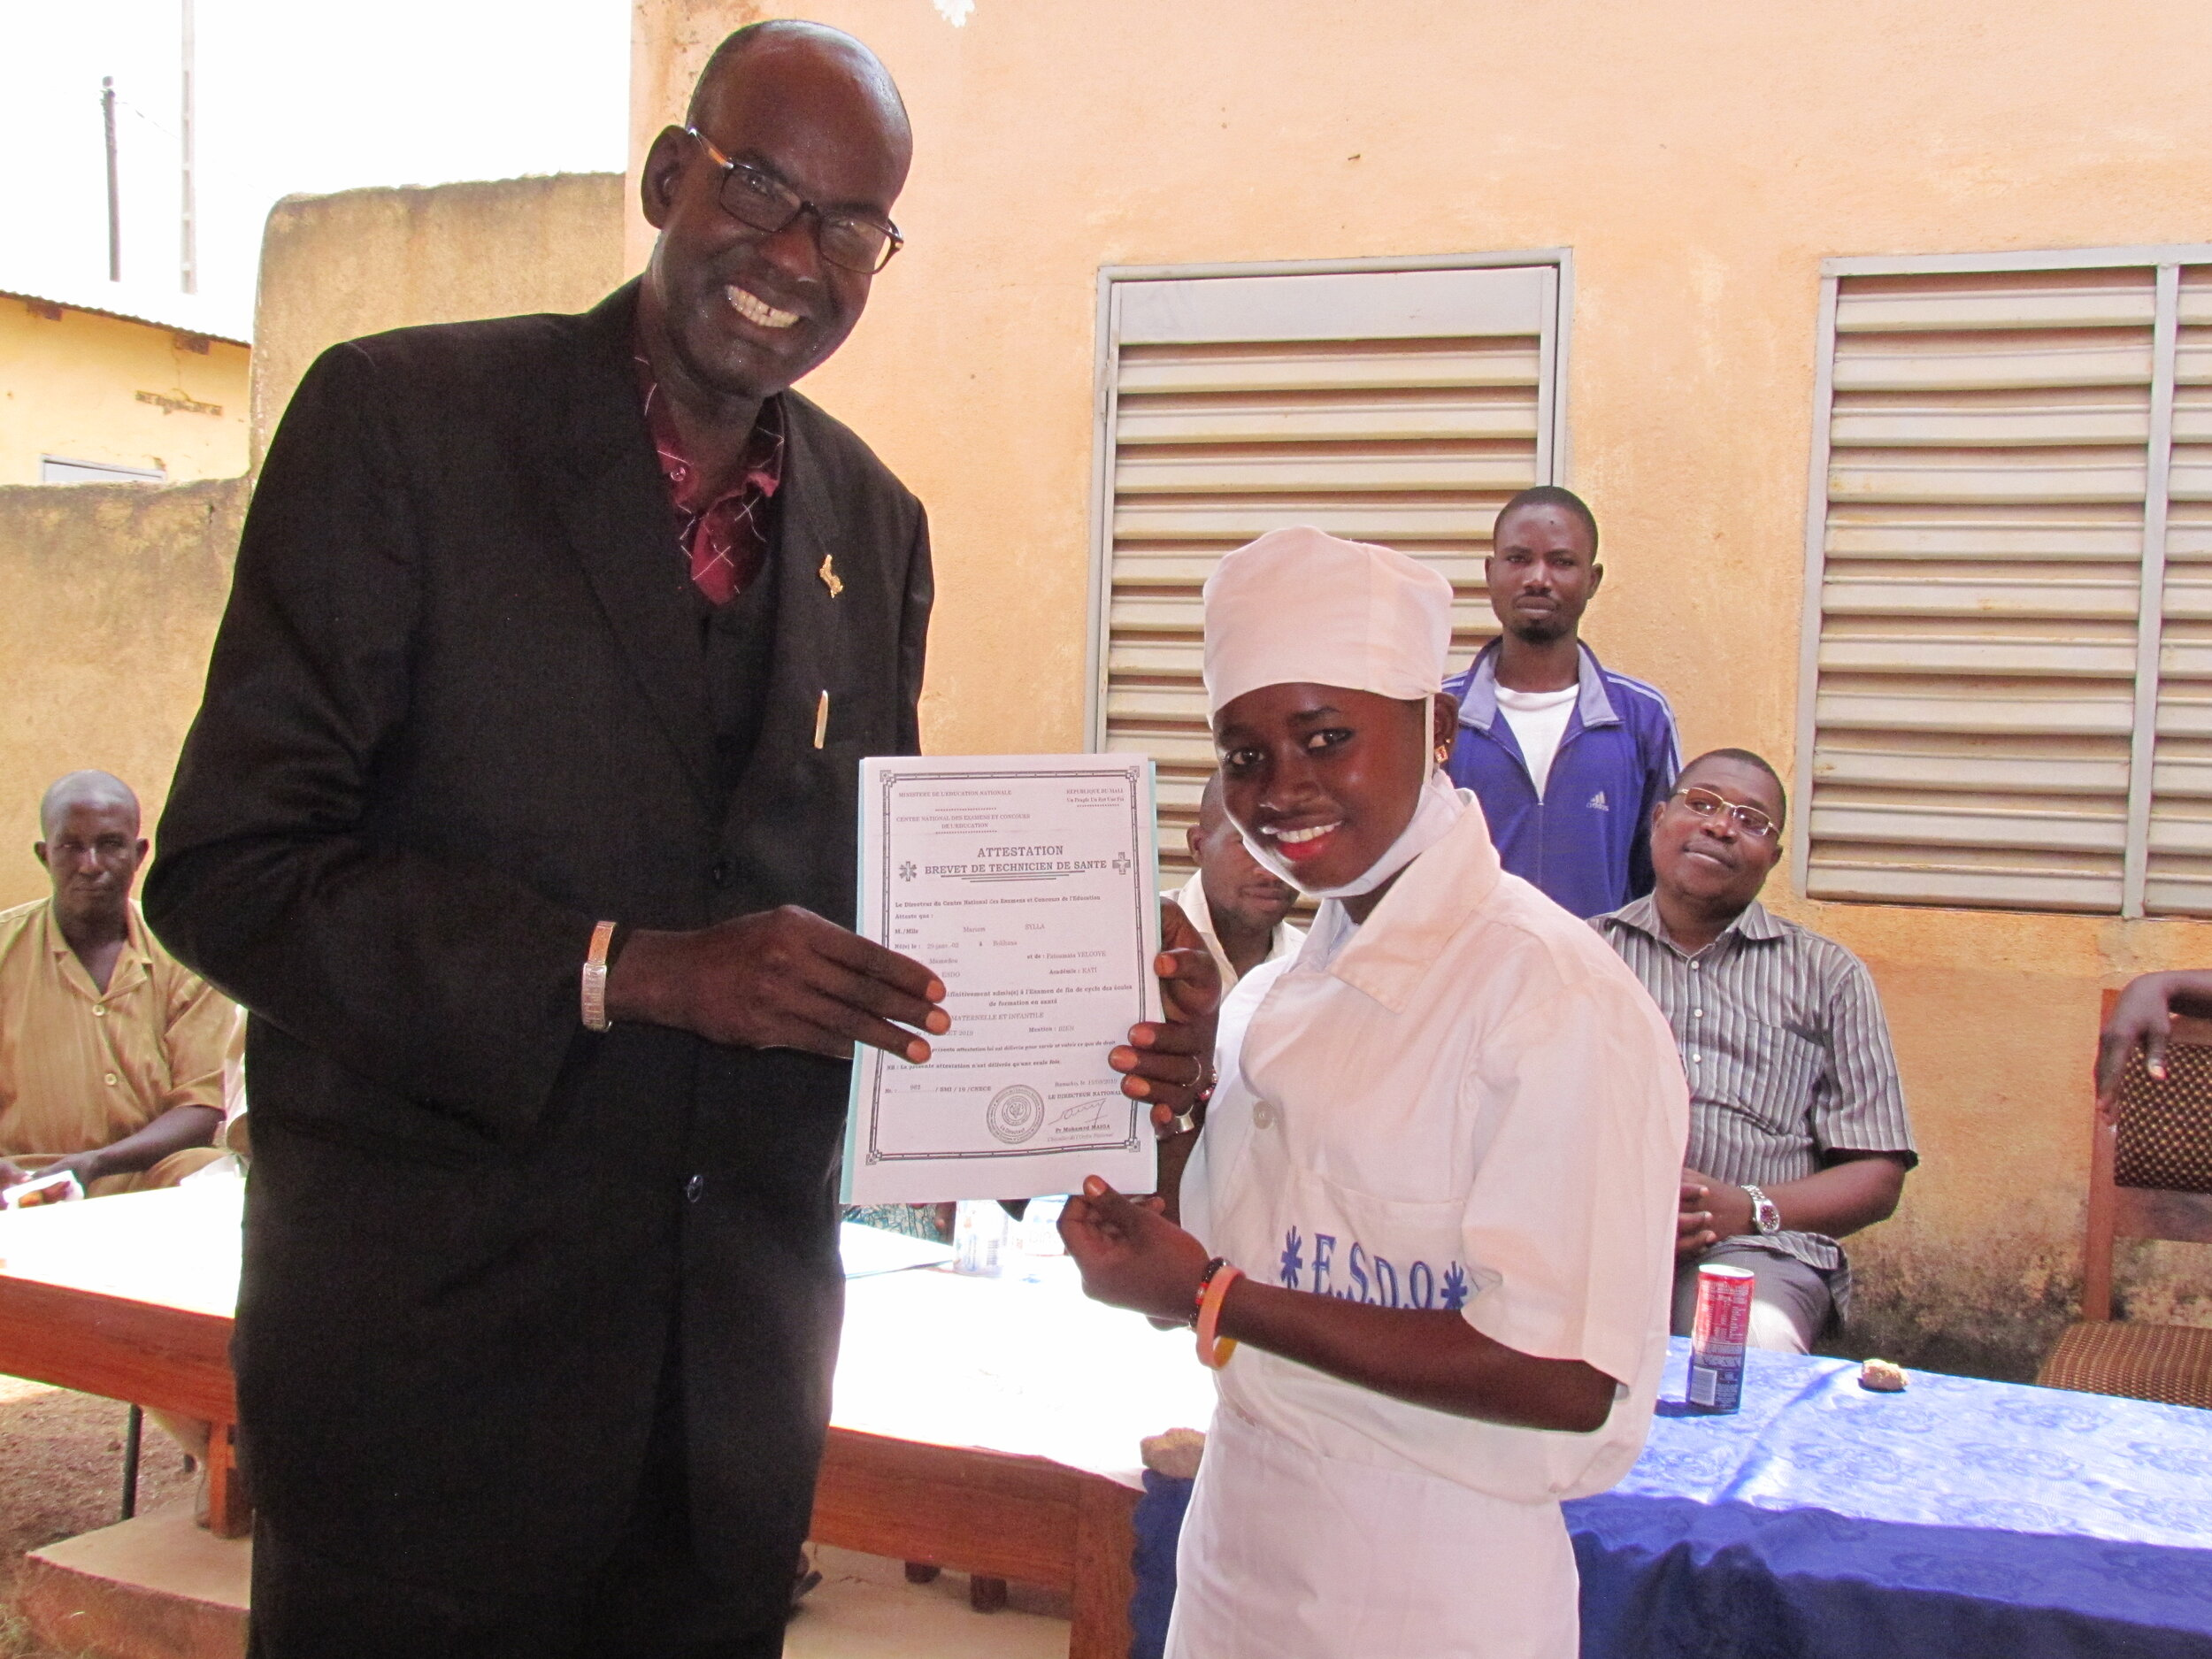 Mariam smiles happily as she graduates from nursing school.